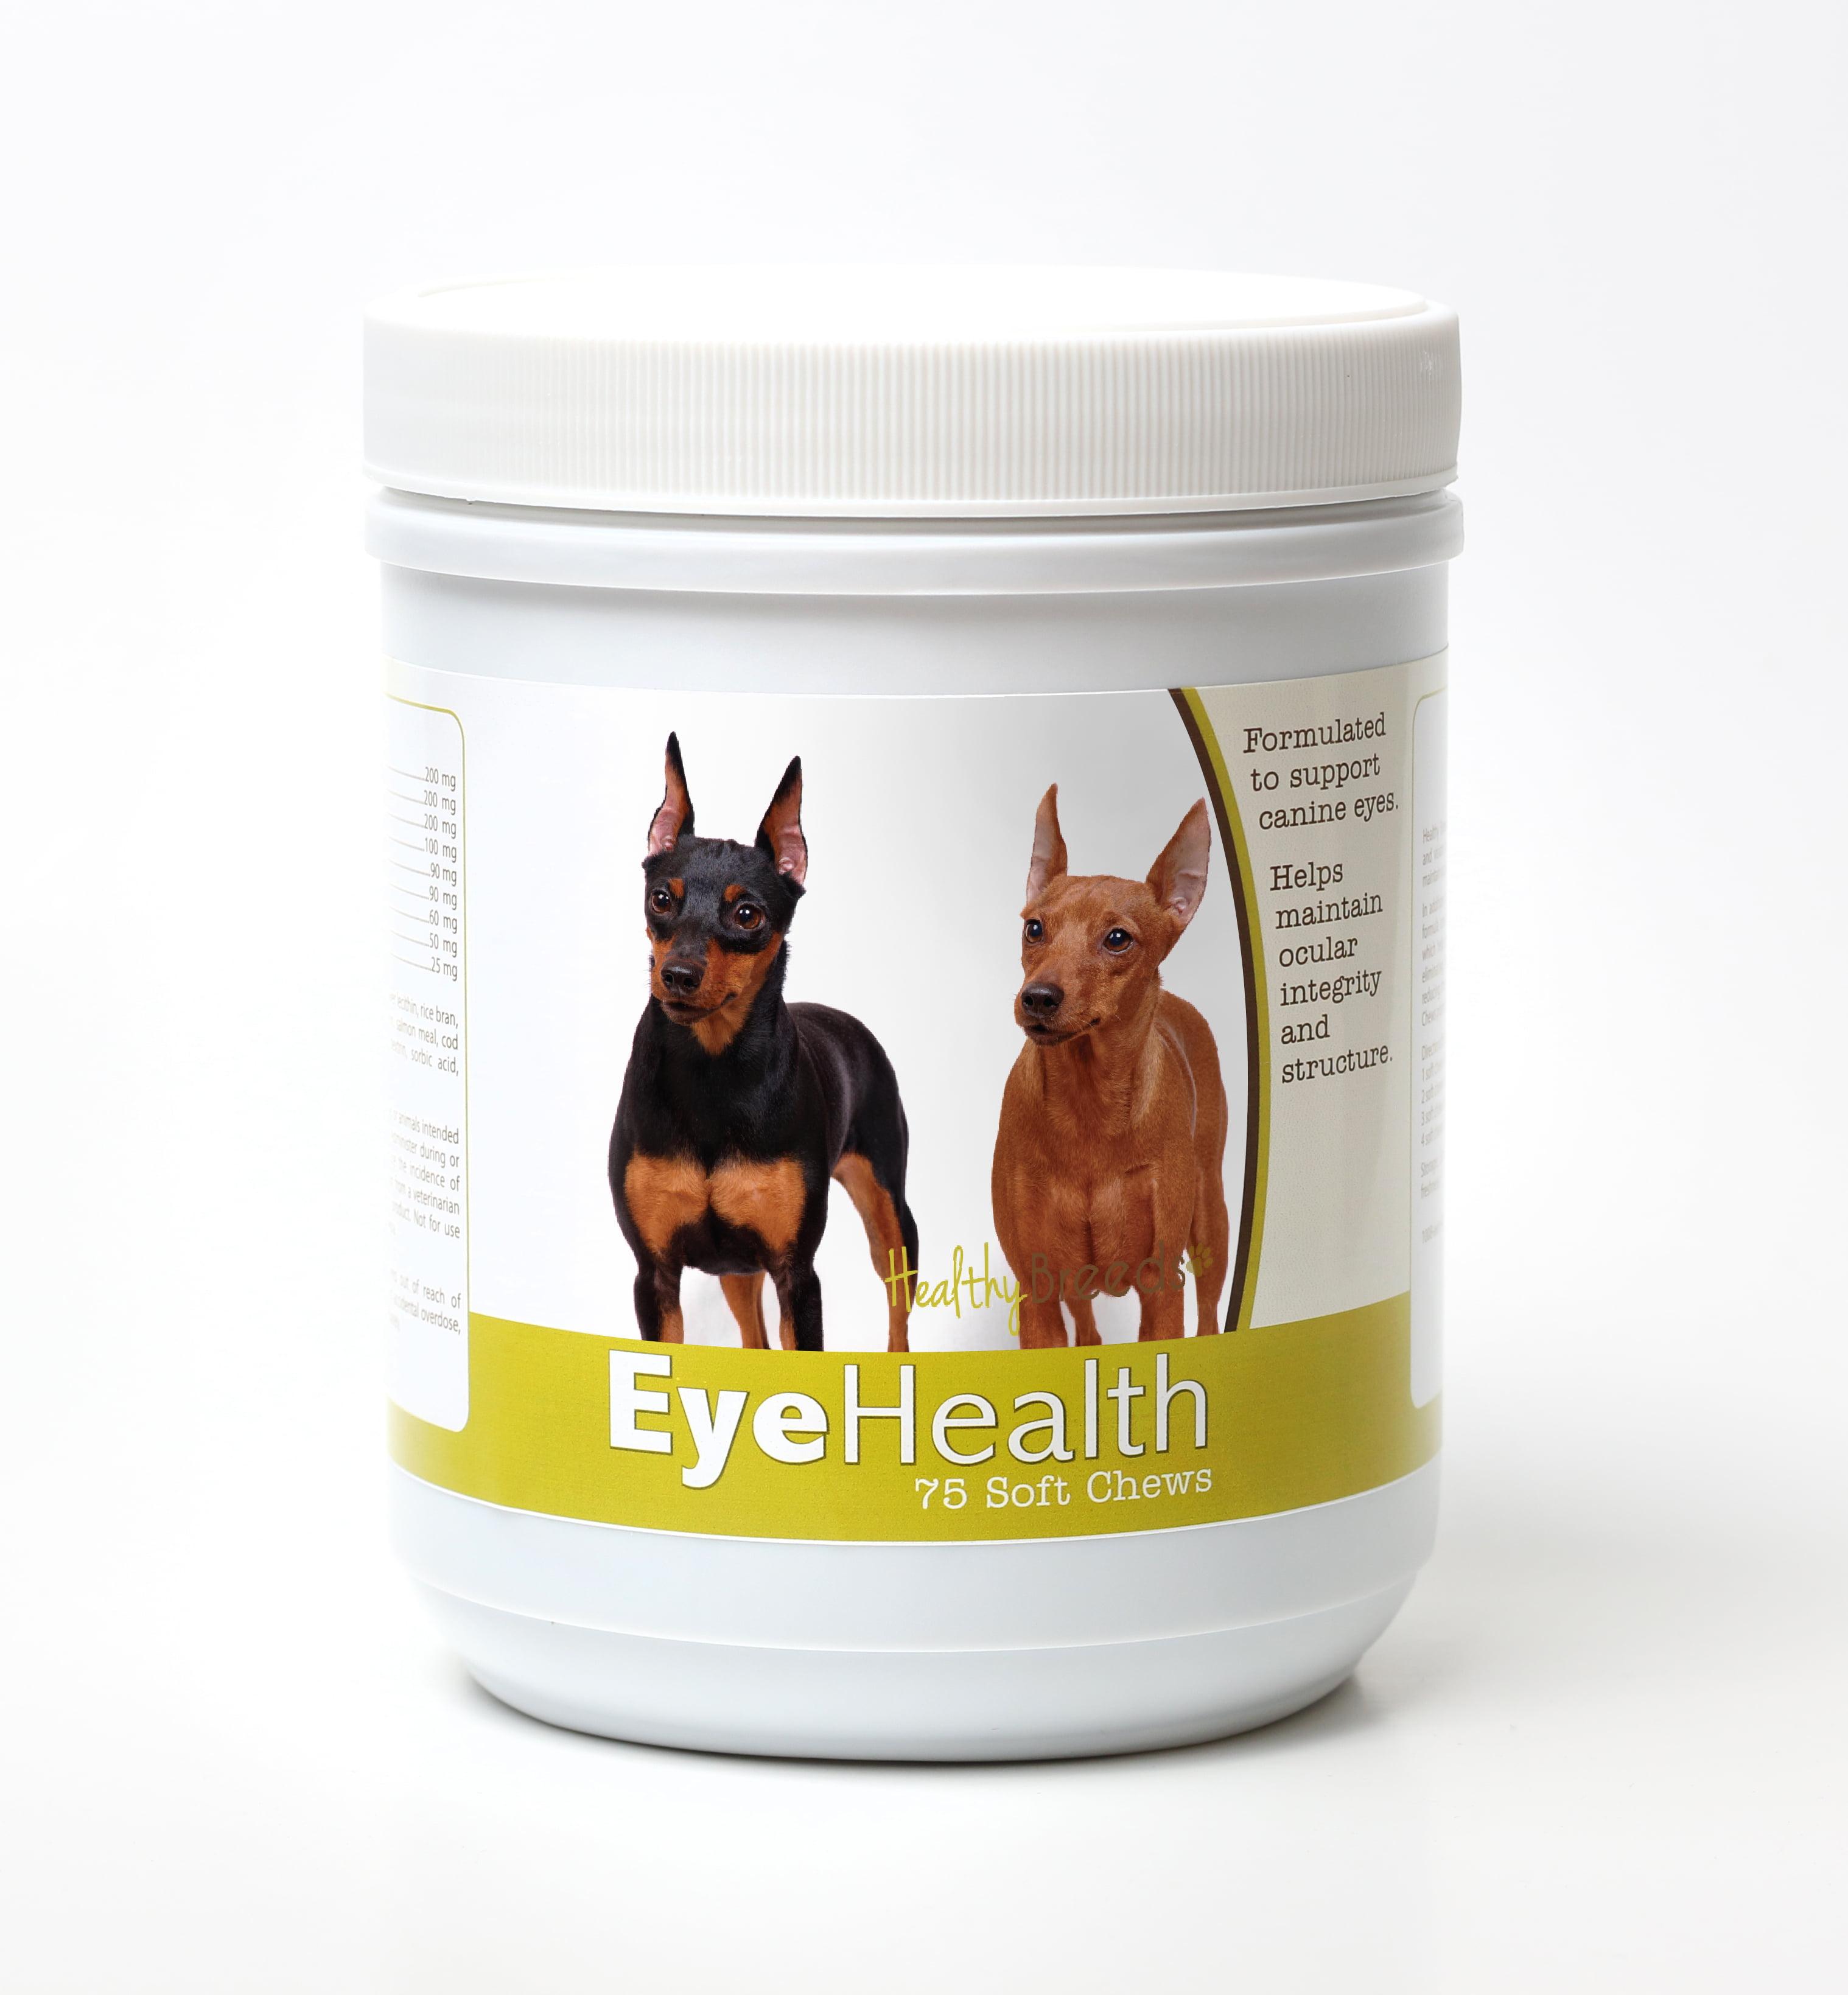 Healthy Breeds Dog Eye Health Support Soft Chews for Miniature Pinscher 75 Count